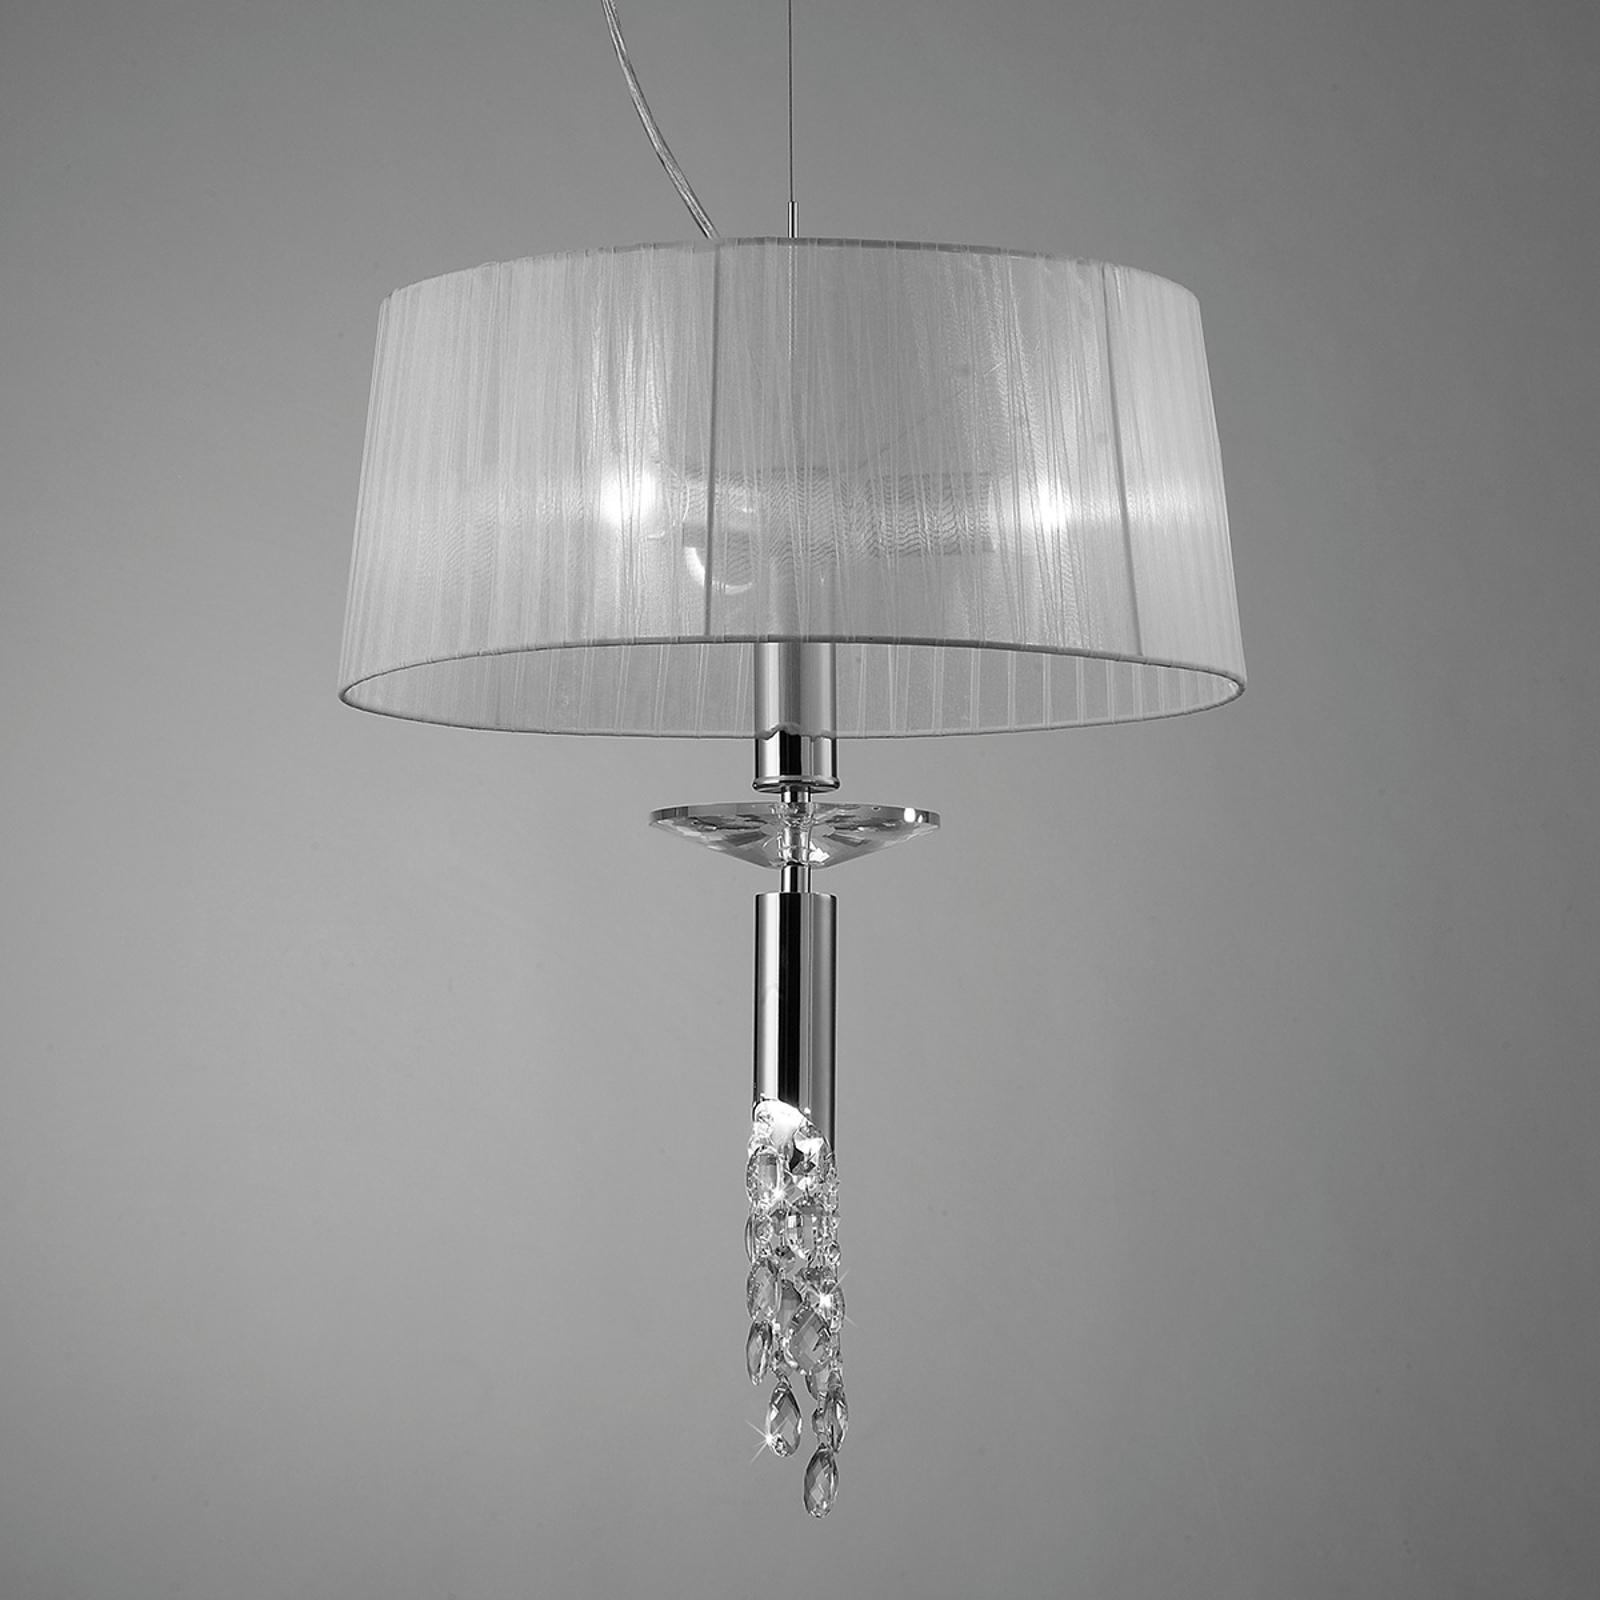 Hanglamp Lilja Ø 46 cm